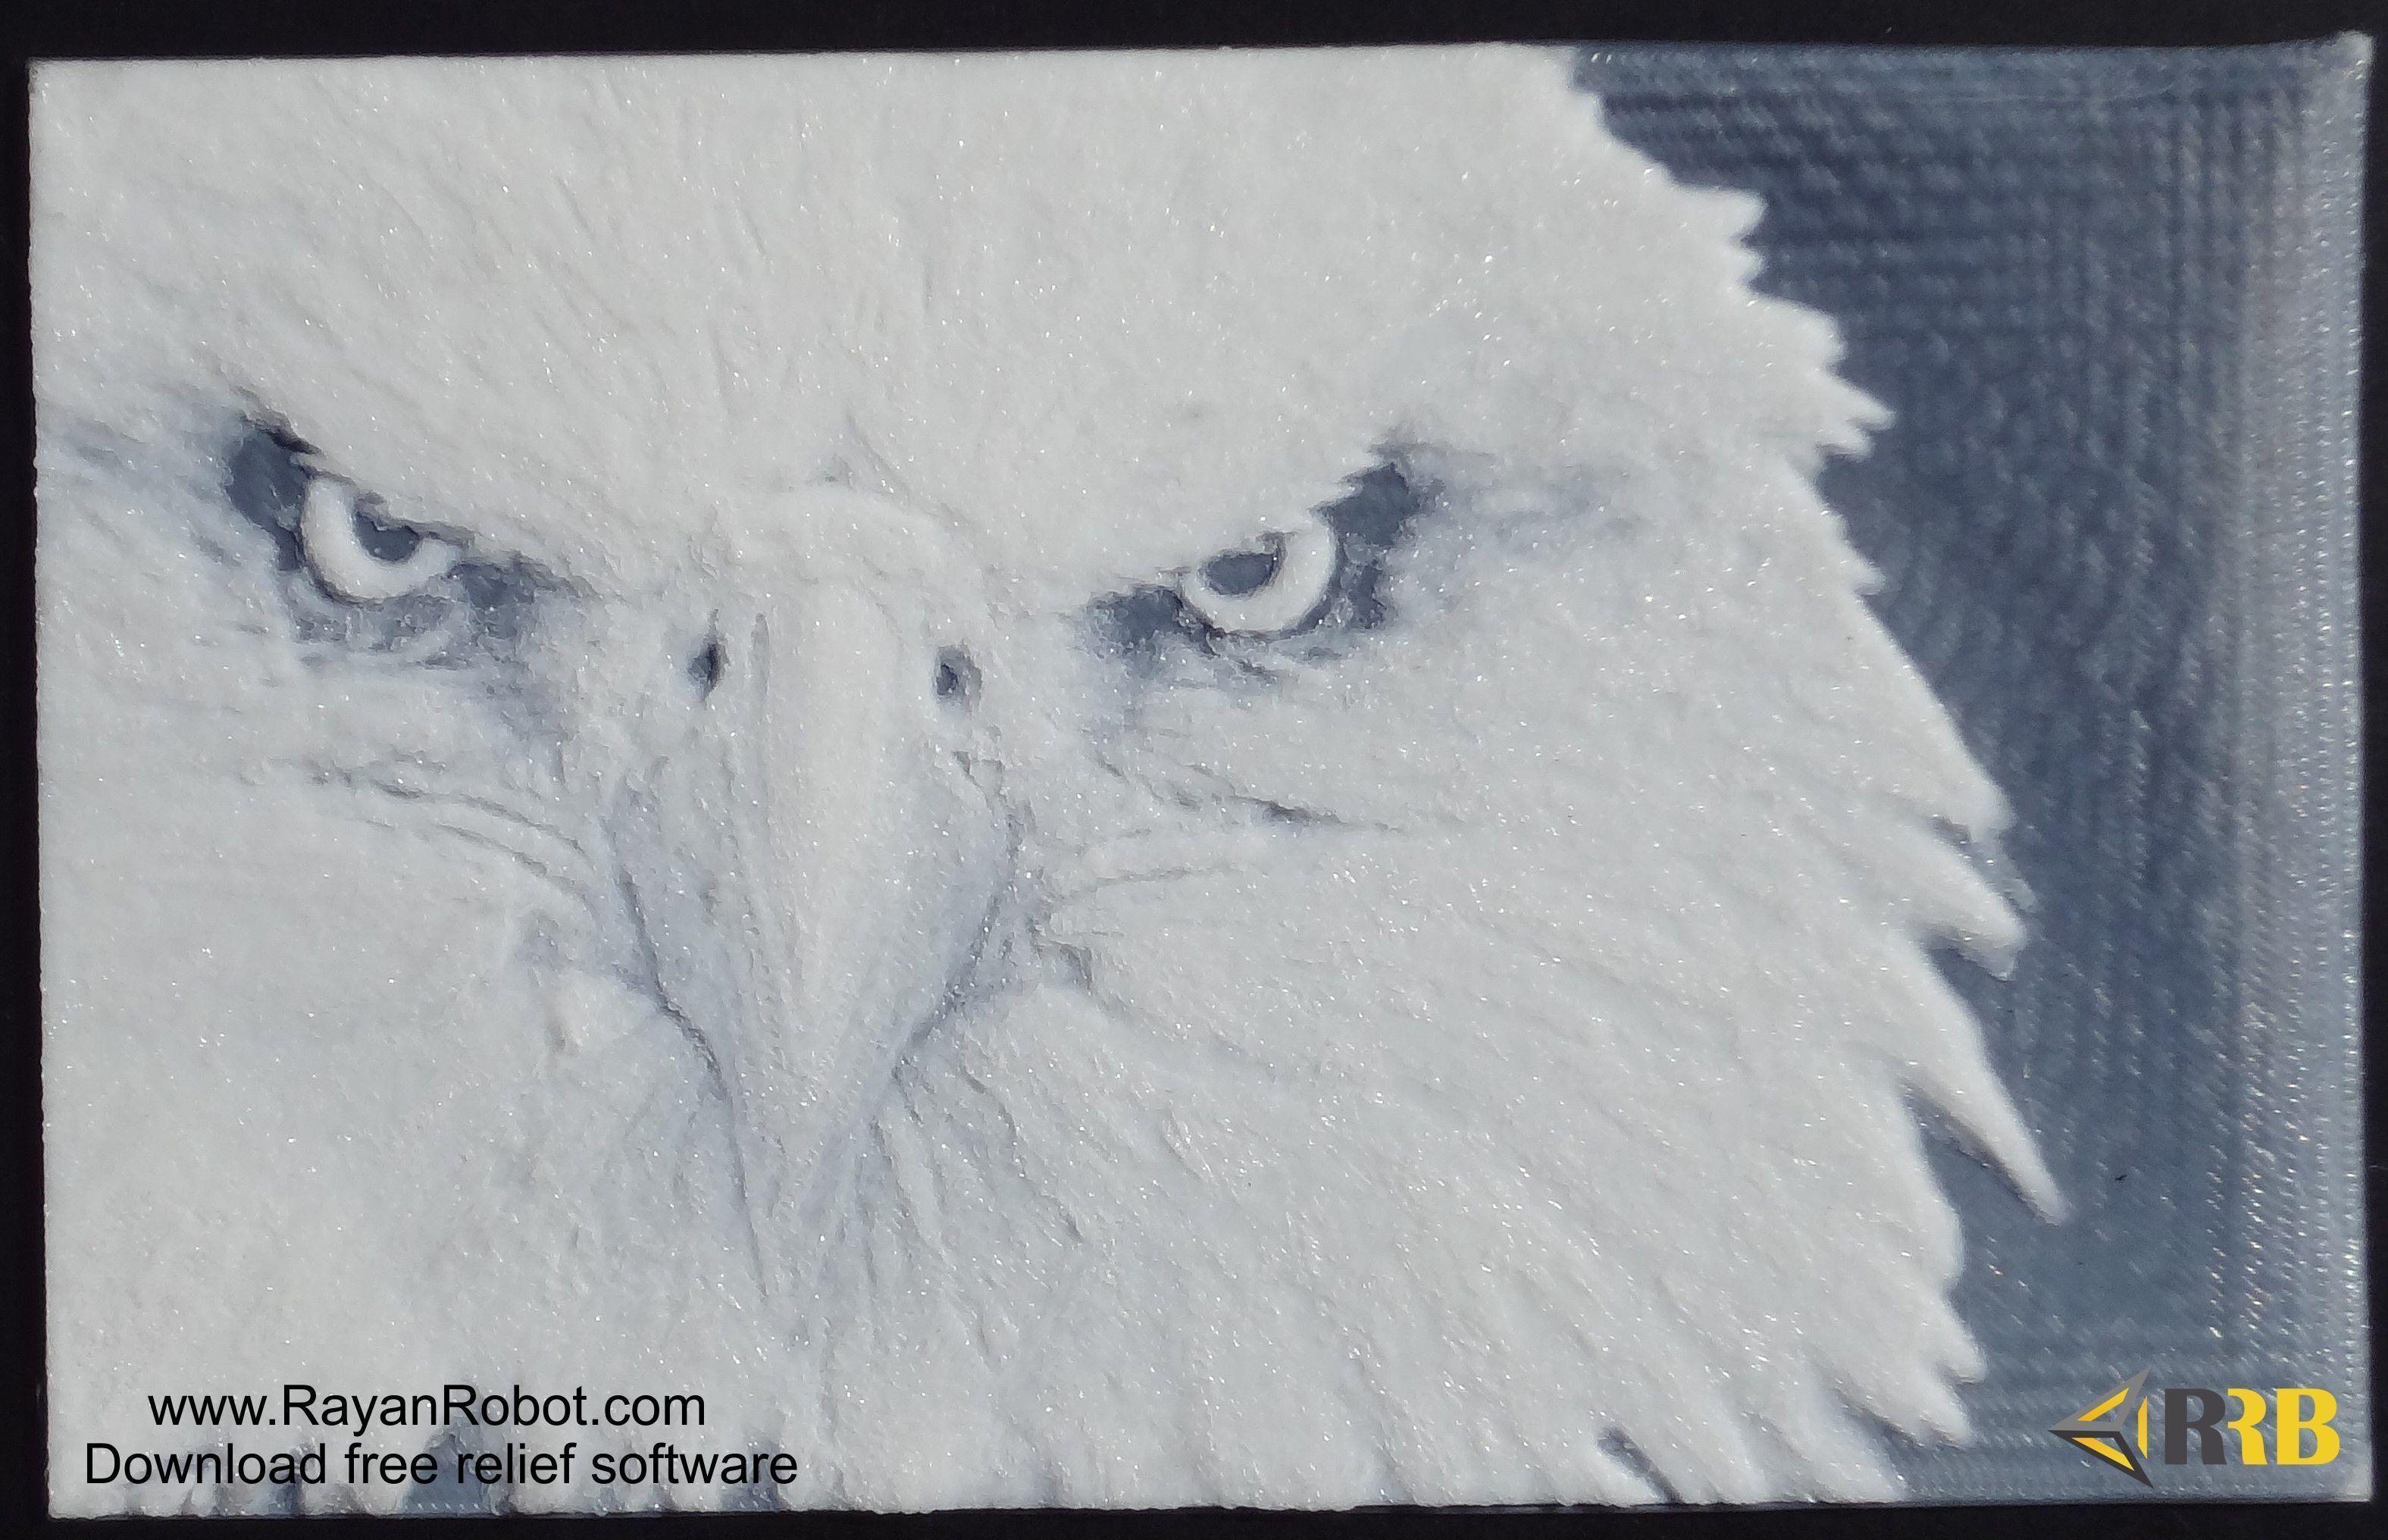 3D Printed Eagle relief by masih akbari | Pinshape